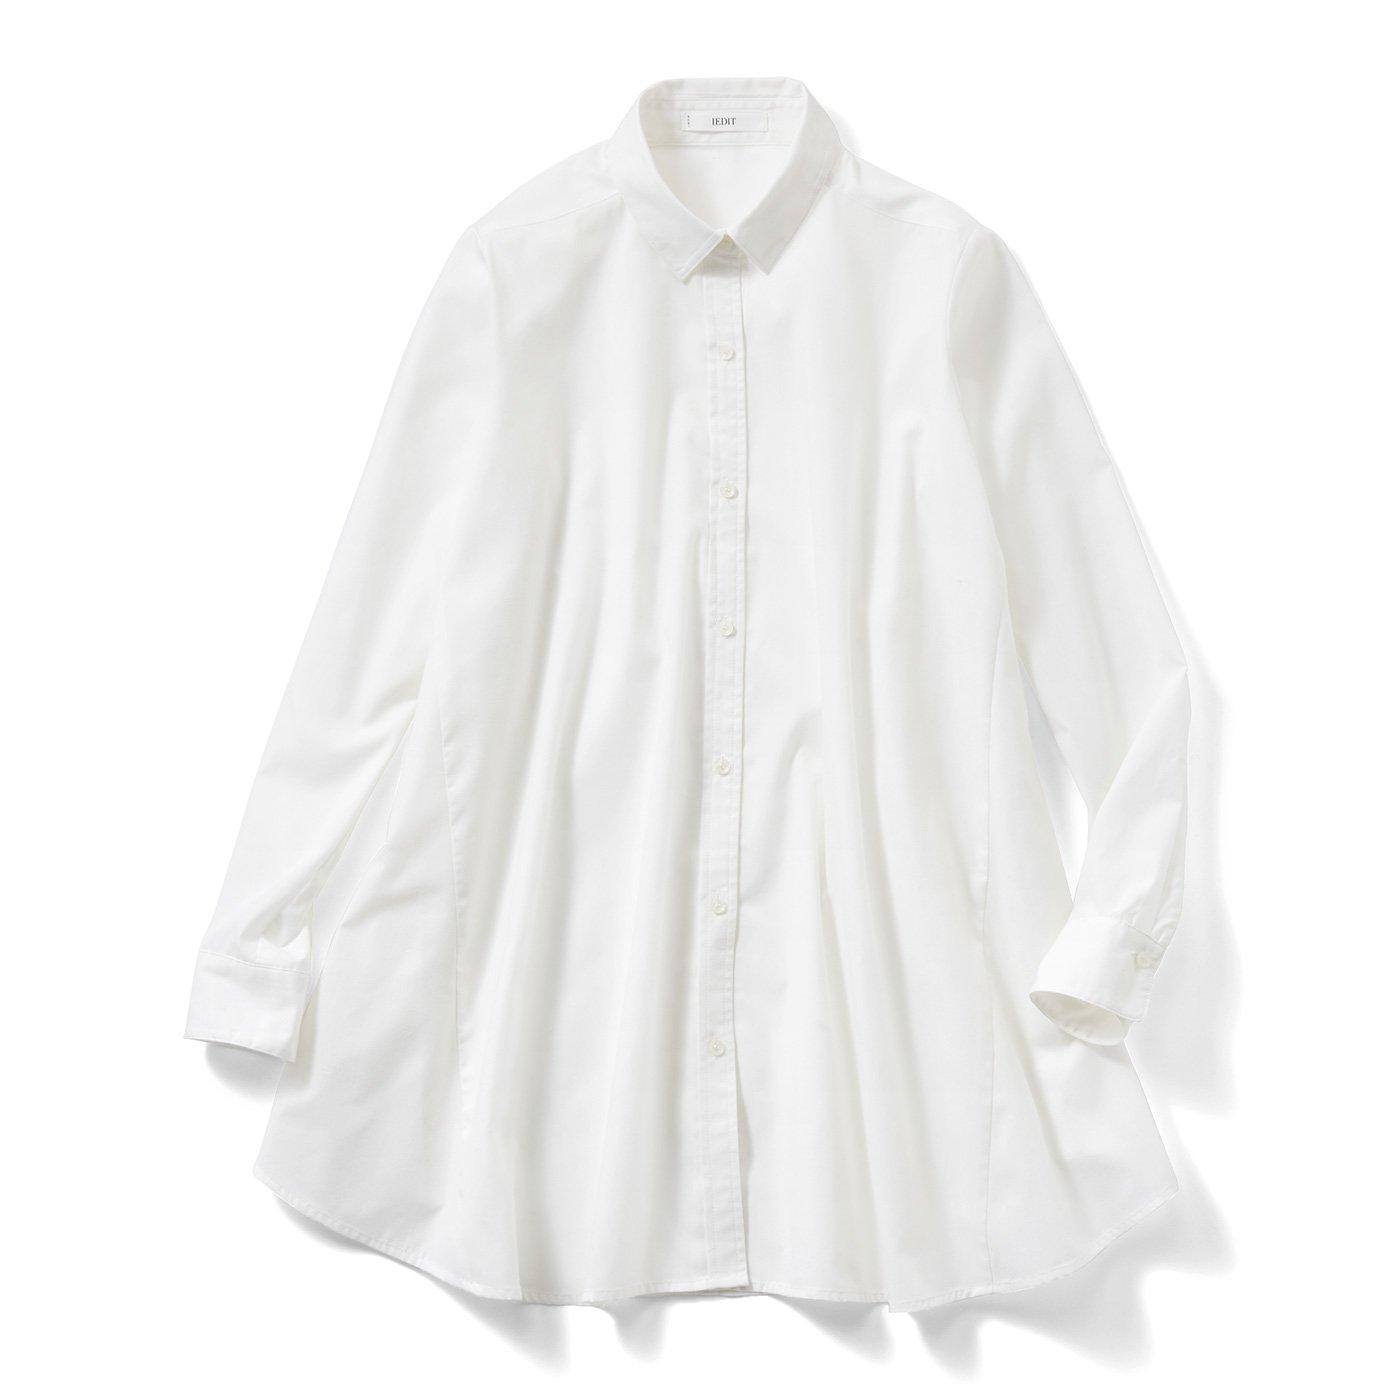 IEDIT[イディット] たっぷりフレアーが印象的なAラインシャツチュニック〈オフホワイト〉